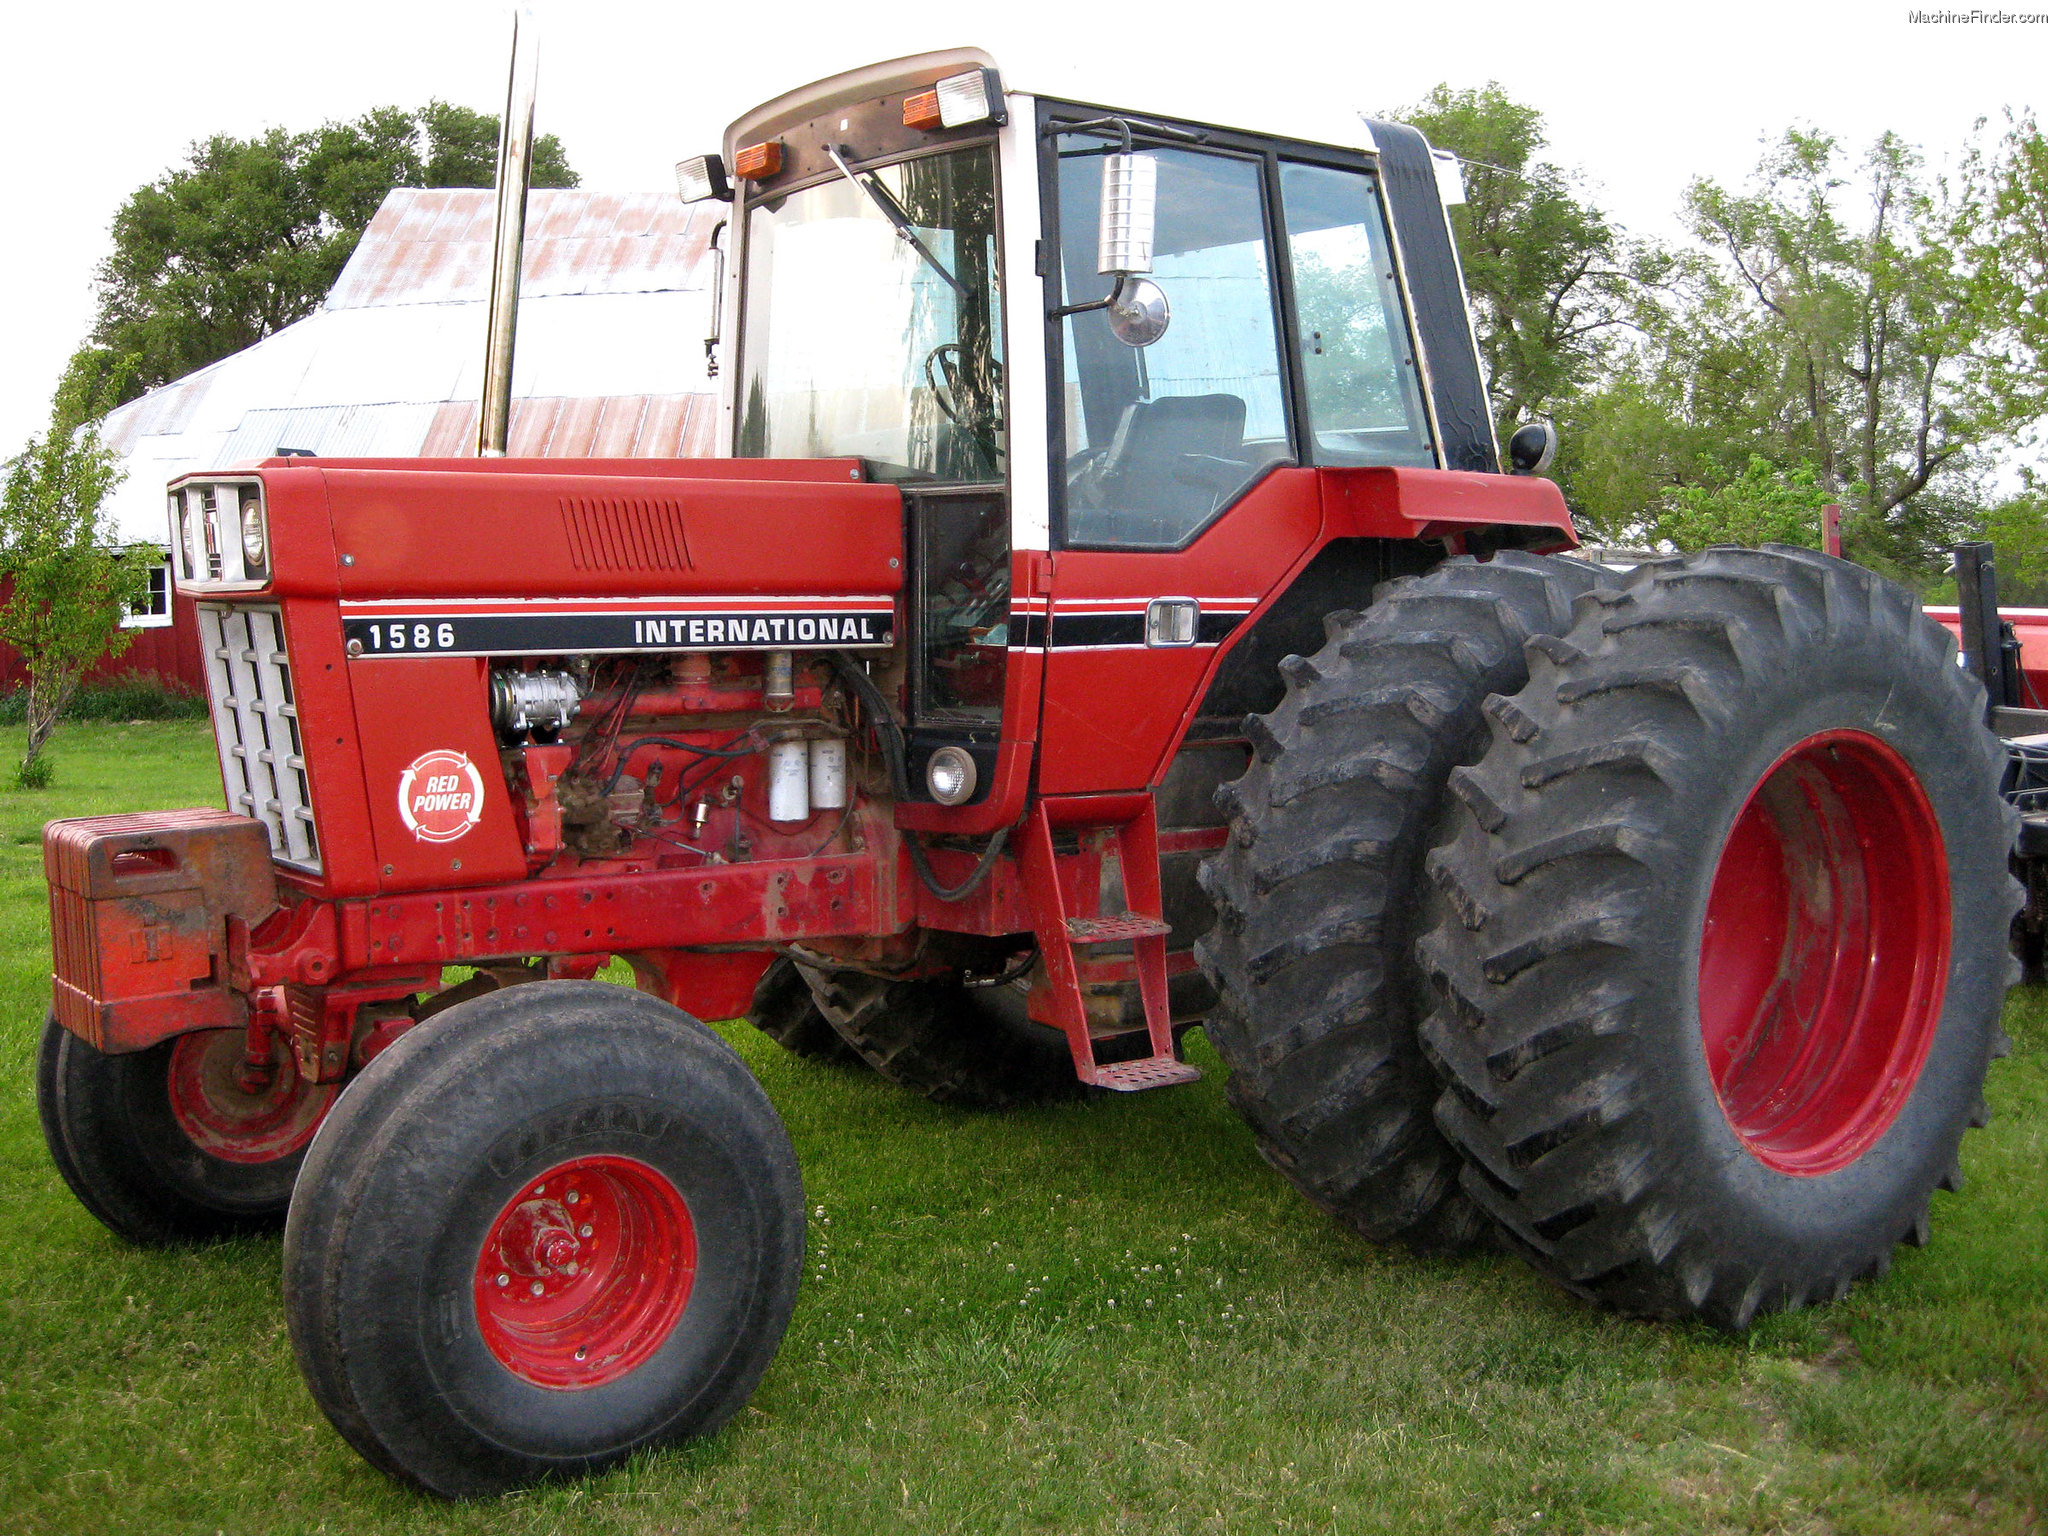 1978 International Harvester 1586 Tractors